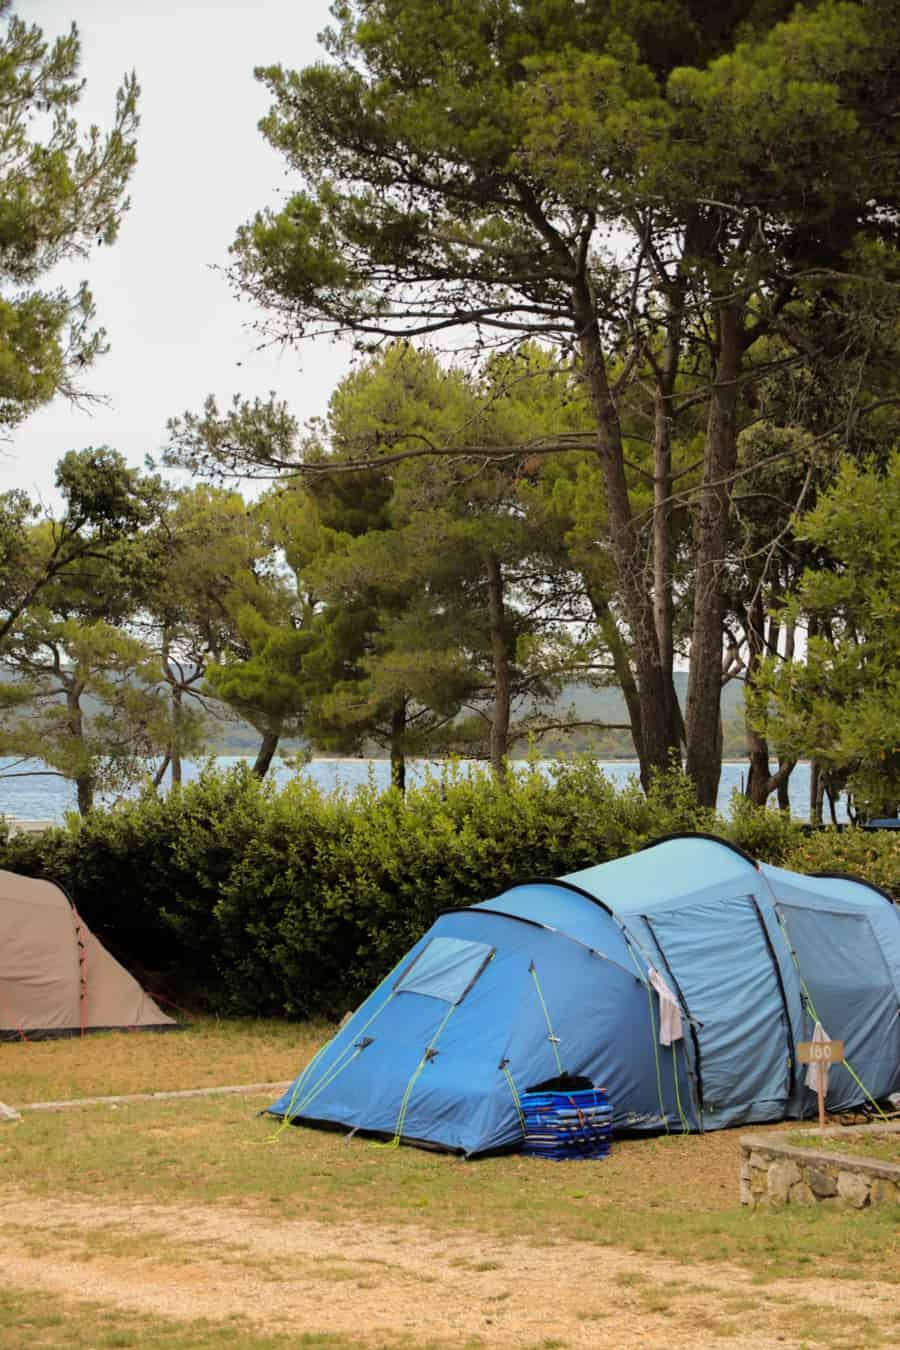 Campingplätze Kroatien: Camping Rapoća - Stellplatz mit Zelt